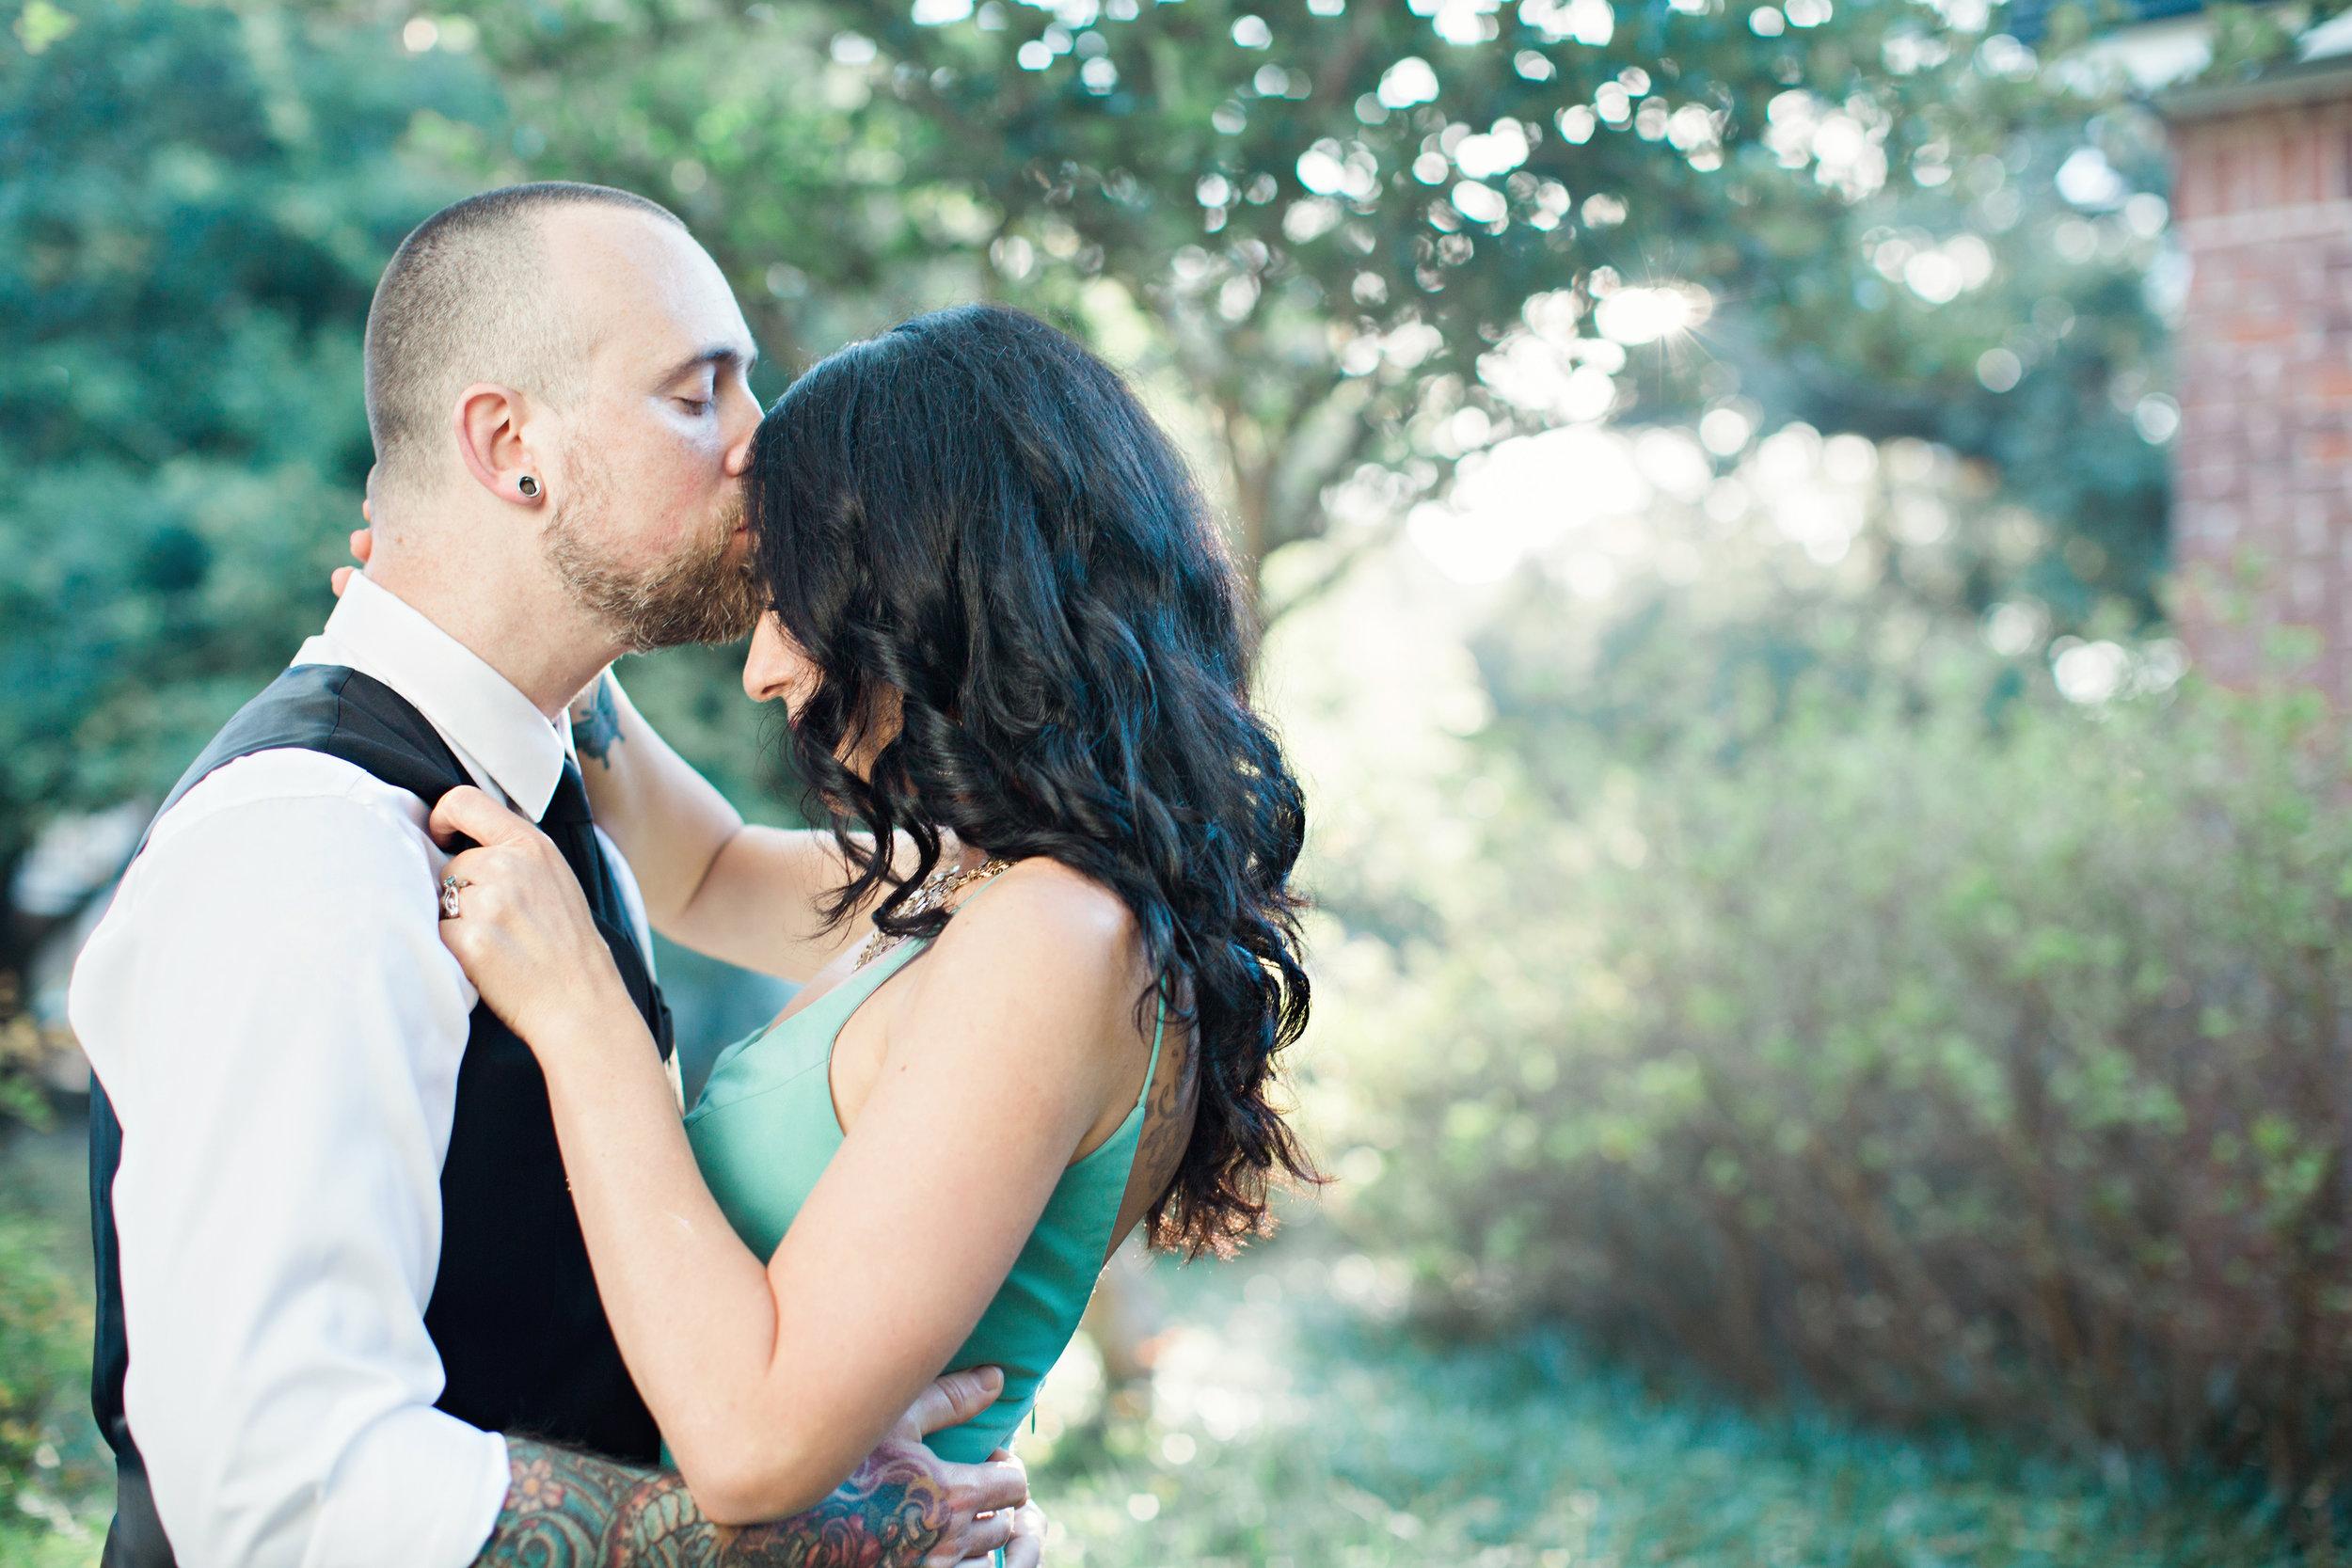 CindyGiovagnoliPhotography_Seattle_Washington_PNW_Couple_Engagement_Portrait_Photography-008.jpg